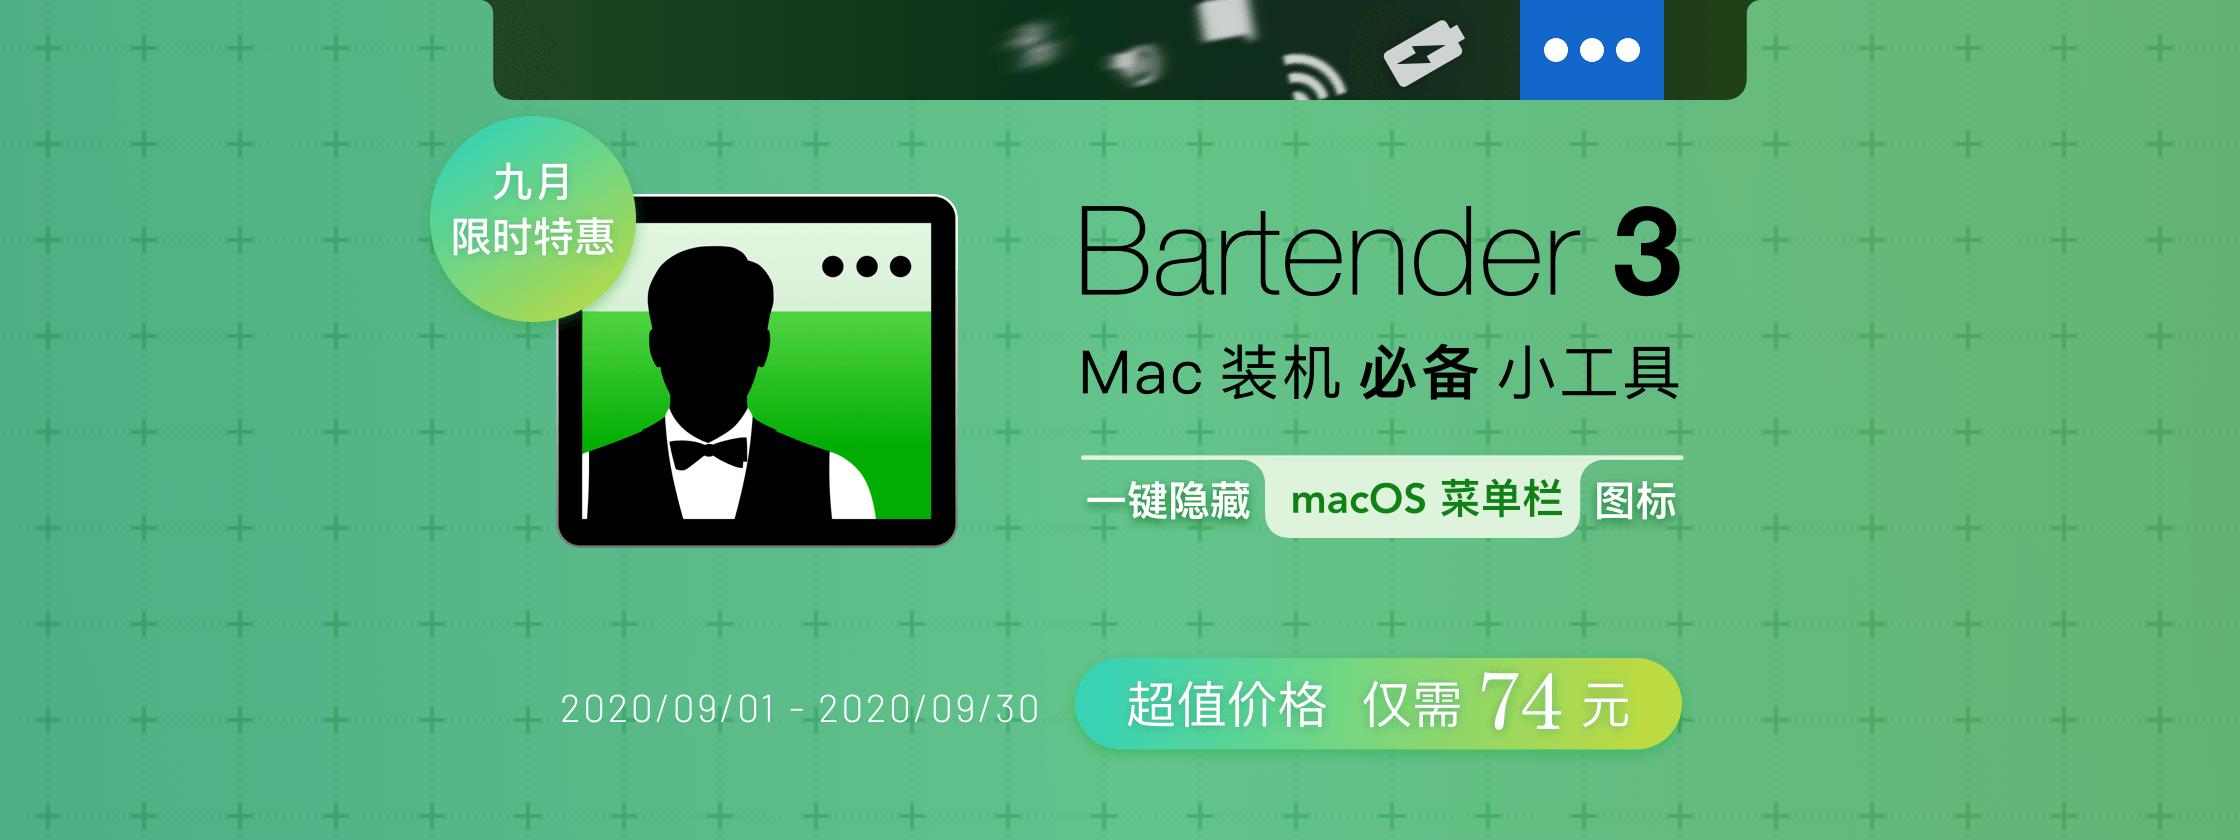 活动 - Bartender 优惠券